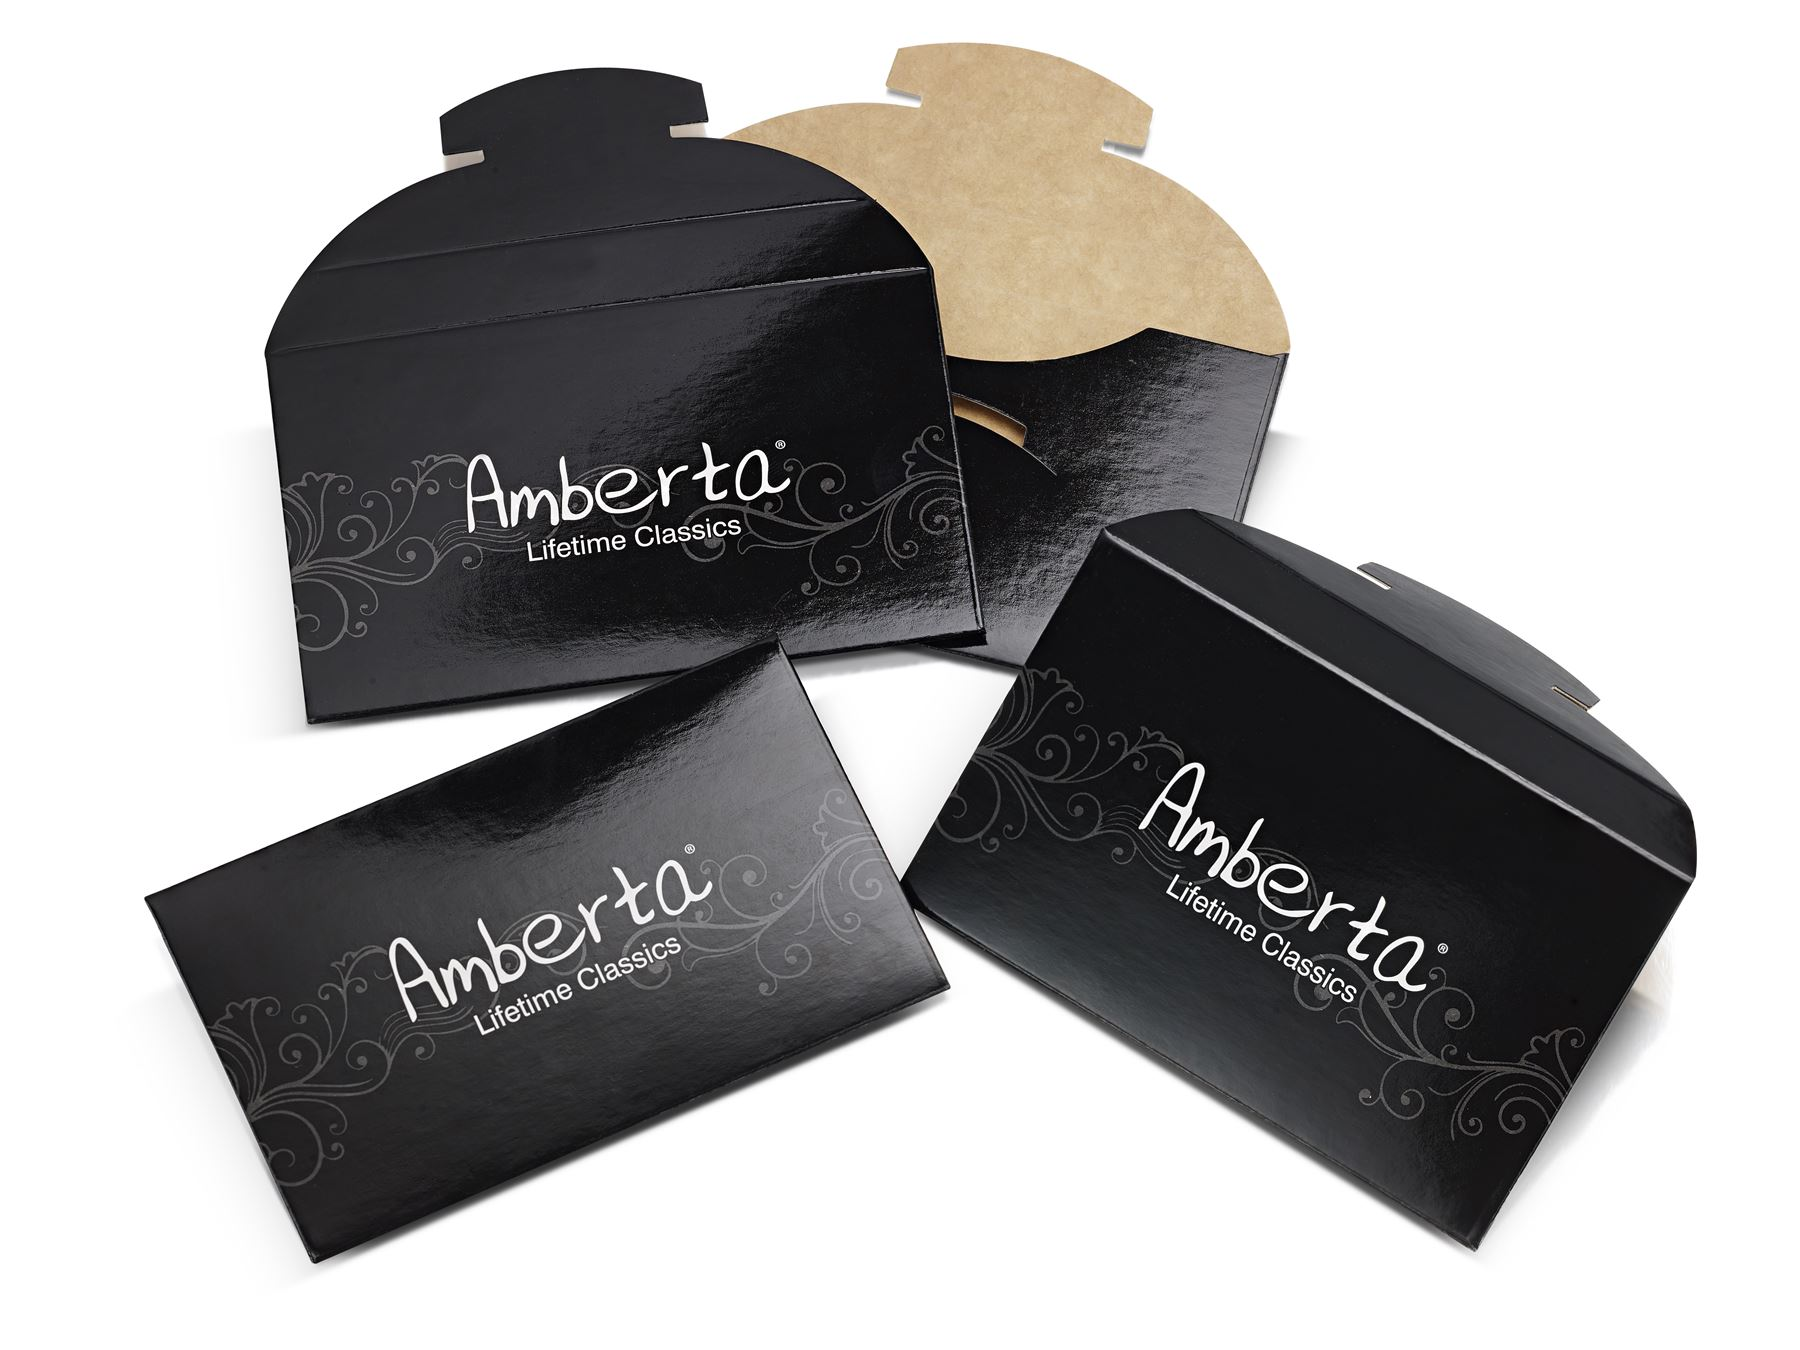 Amberta-Anillo-para-Pies-en-Plata-de-Ley-925-Anillo-Midi-Ajustable-para-Mujer miniatura 10